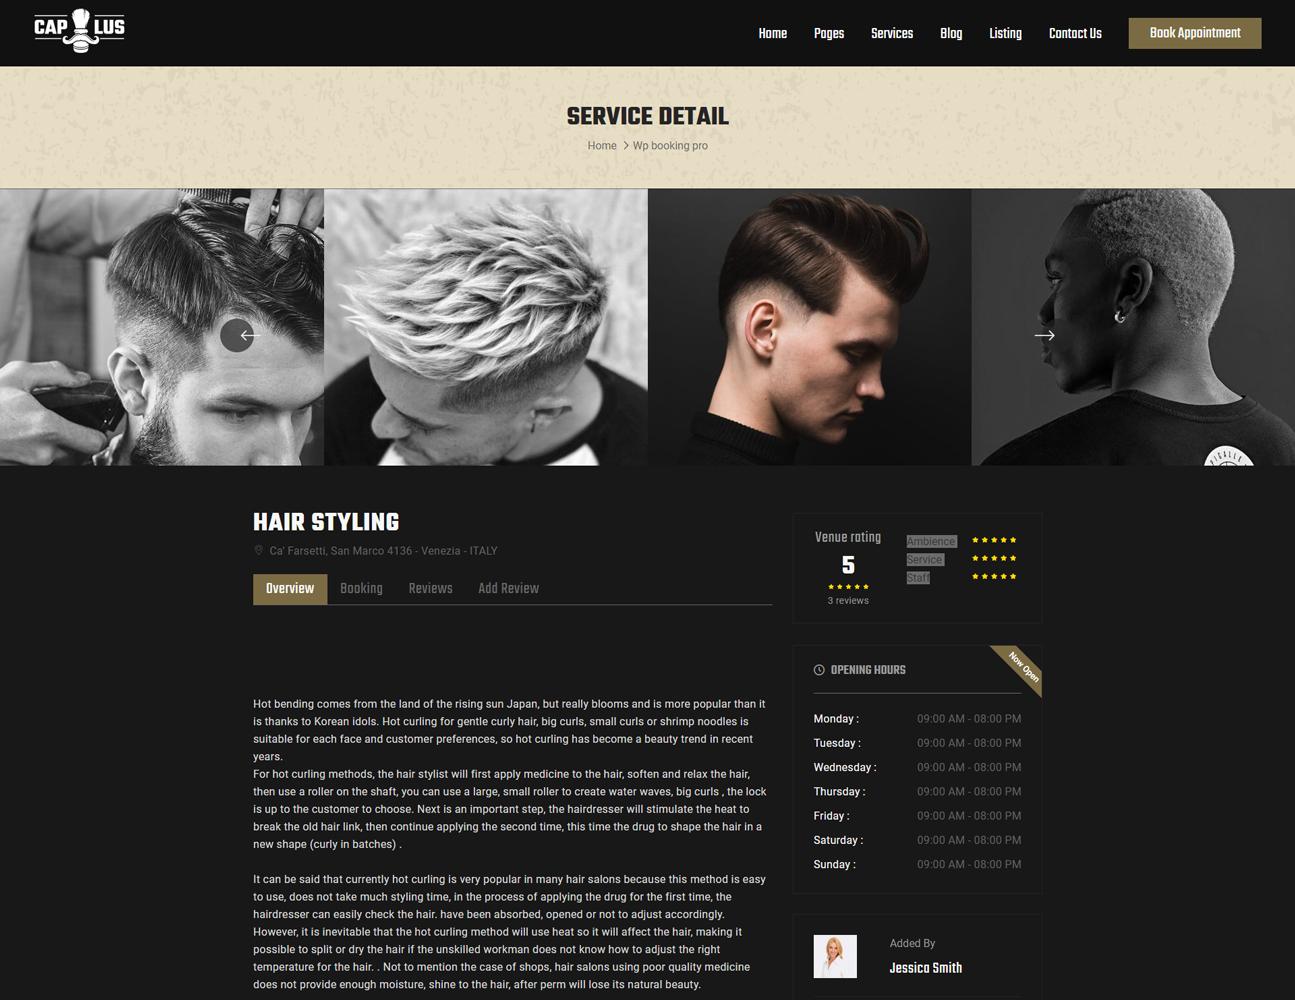 screenshots Capillus - The WordPress Theme for Hair Salon Booking